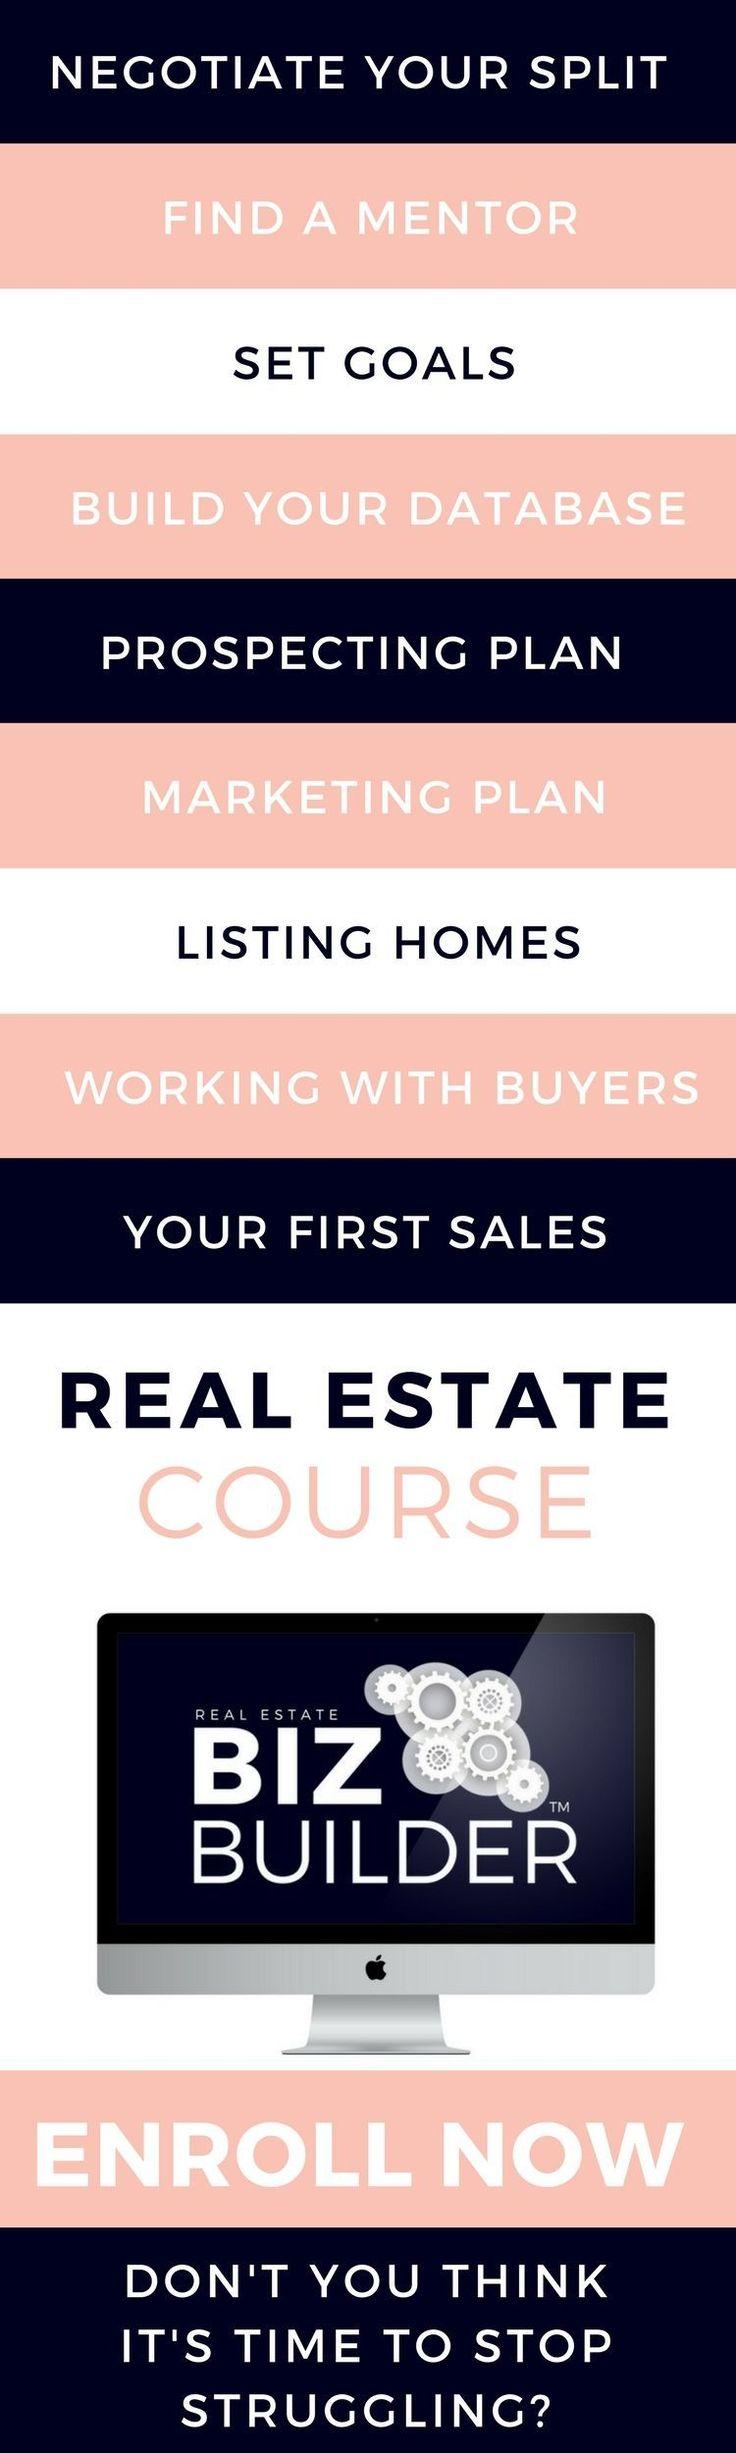 best 25+ real estate templates ideas on pinterest | real estate, Presentation templates